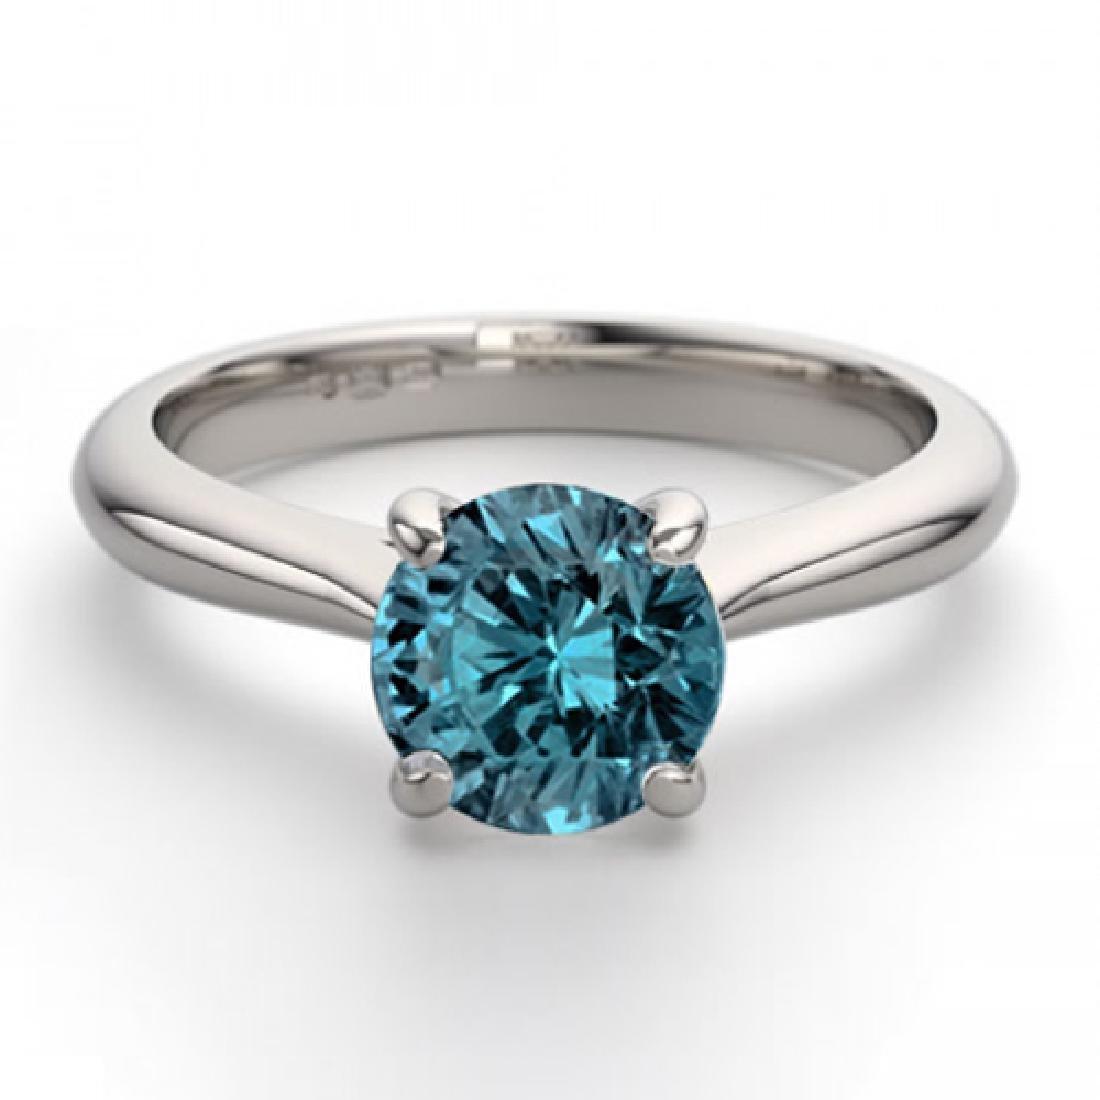 14K White Gold 1.02 ctw Blue Diamond Solitaire Ring -